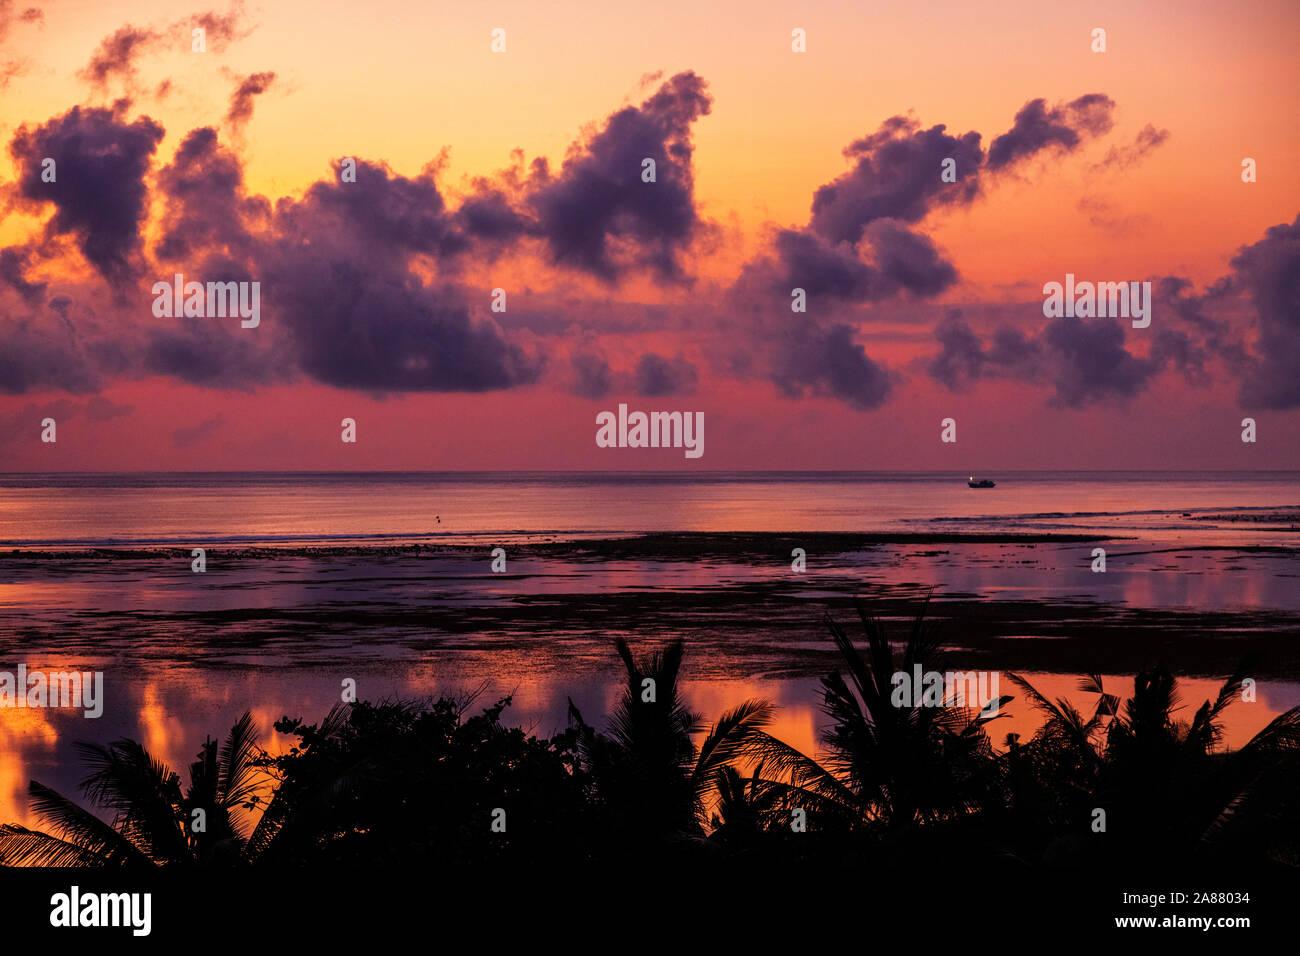 sunrise-over-the-indian-ocean-bali-sea-at-benoa-bay-benoa-bali-indonesia-southeast-asia-asia-2A88034.jpg